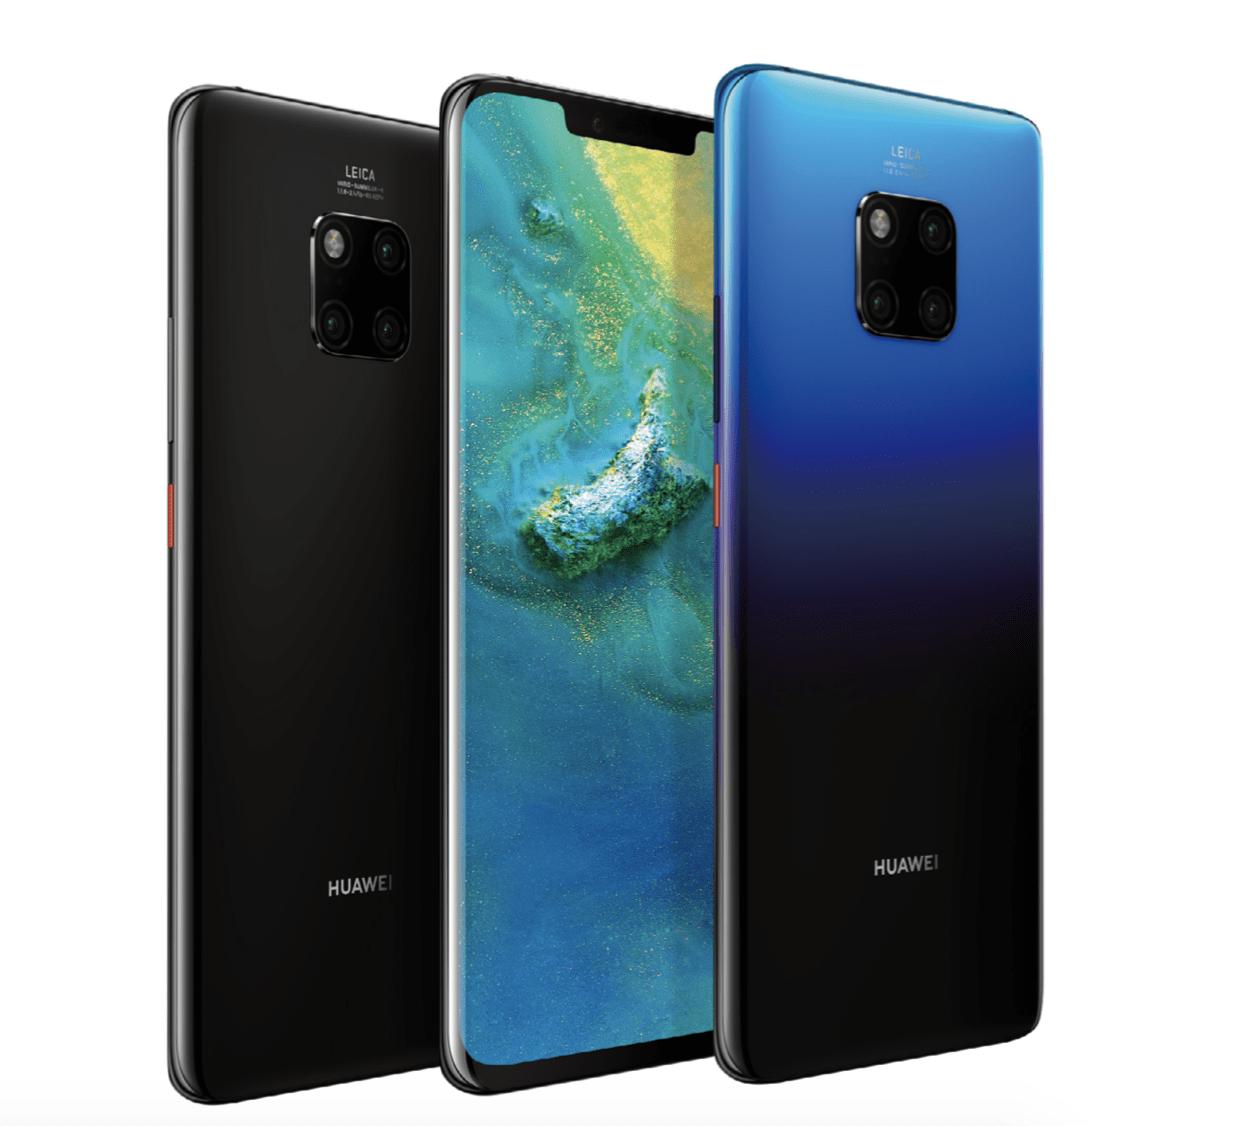 Huawei Mate 20 Lite, Mate 20 et Mate 20 Pro